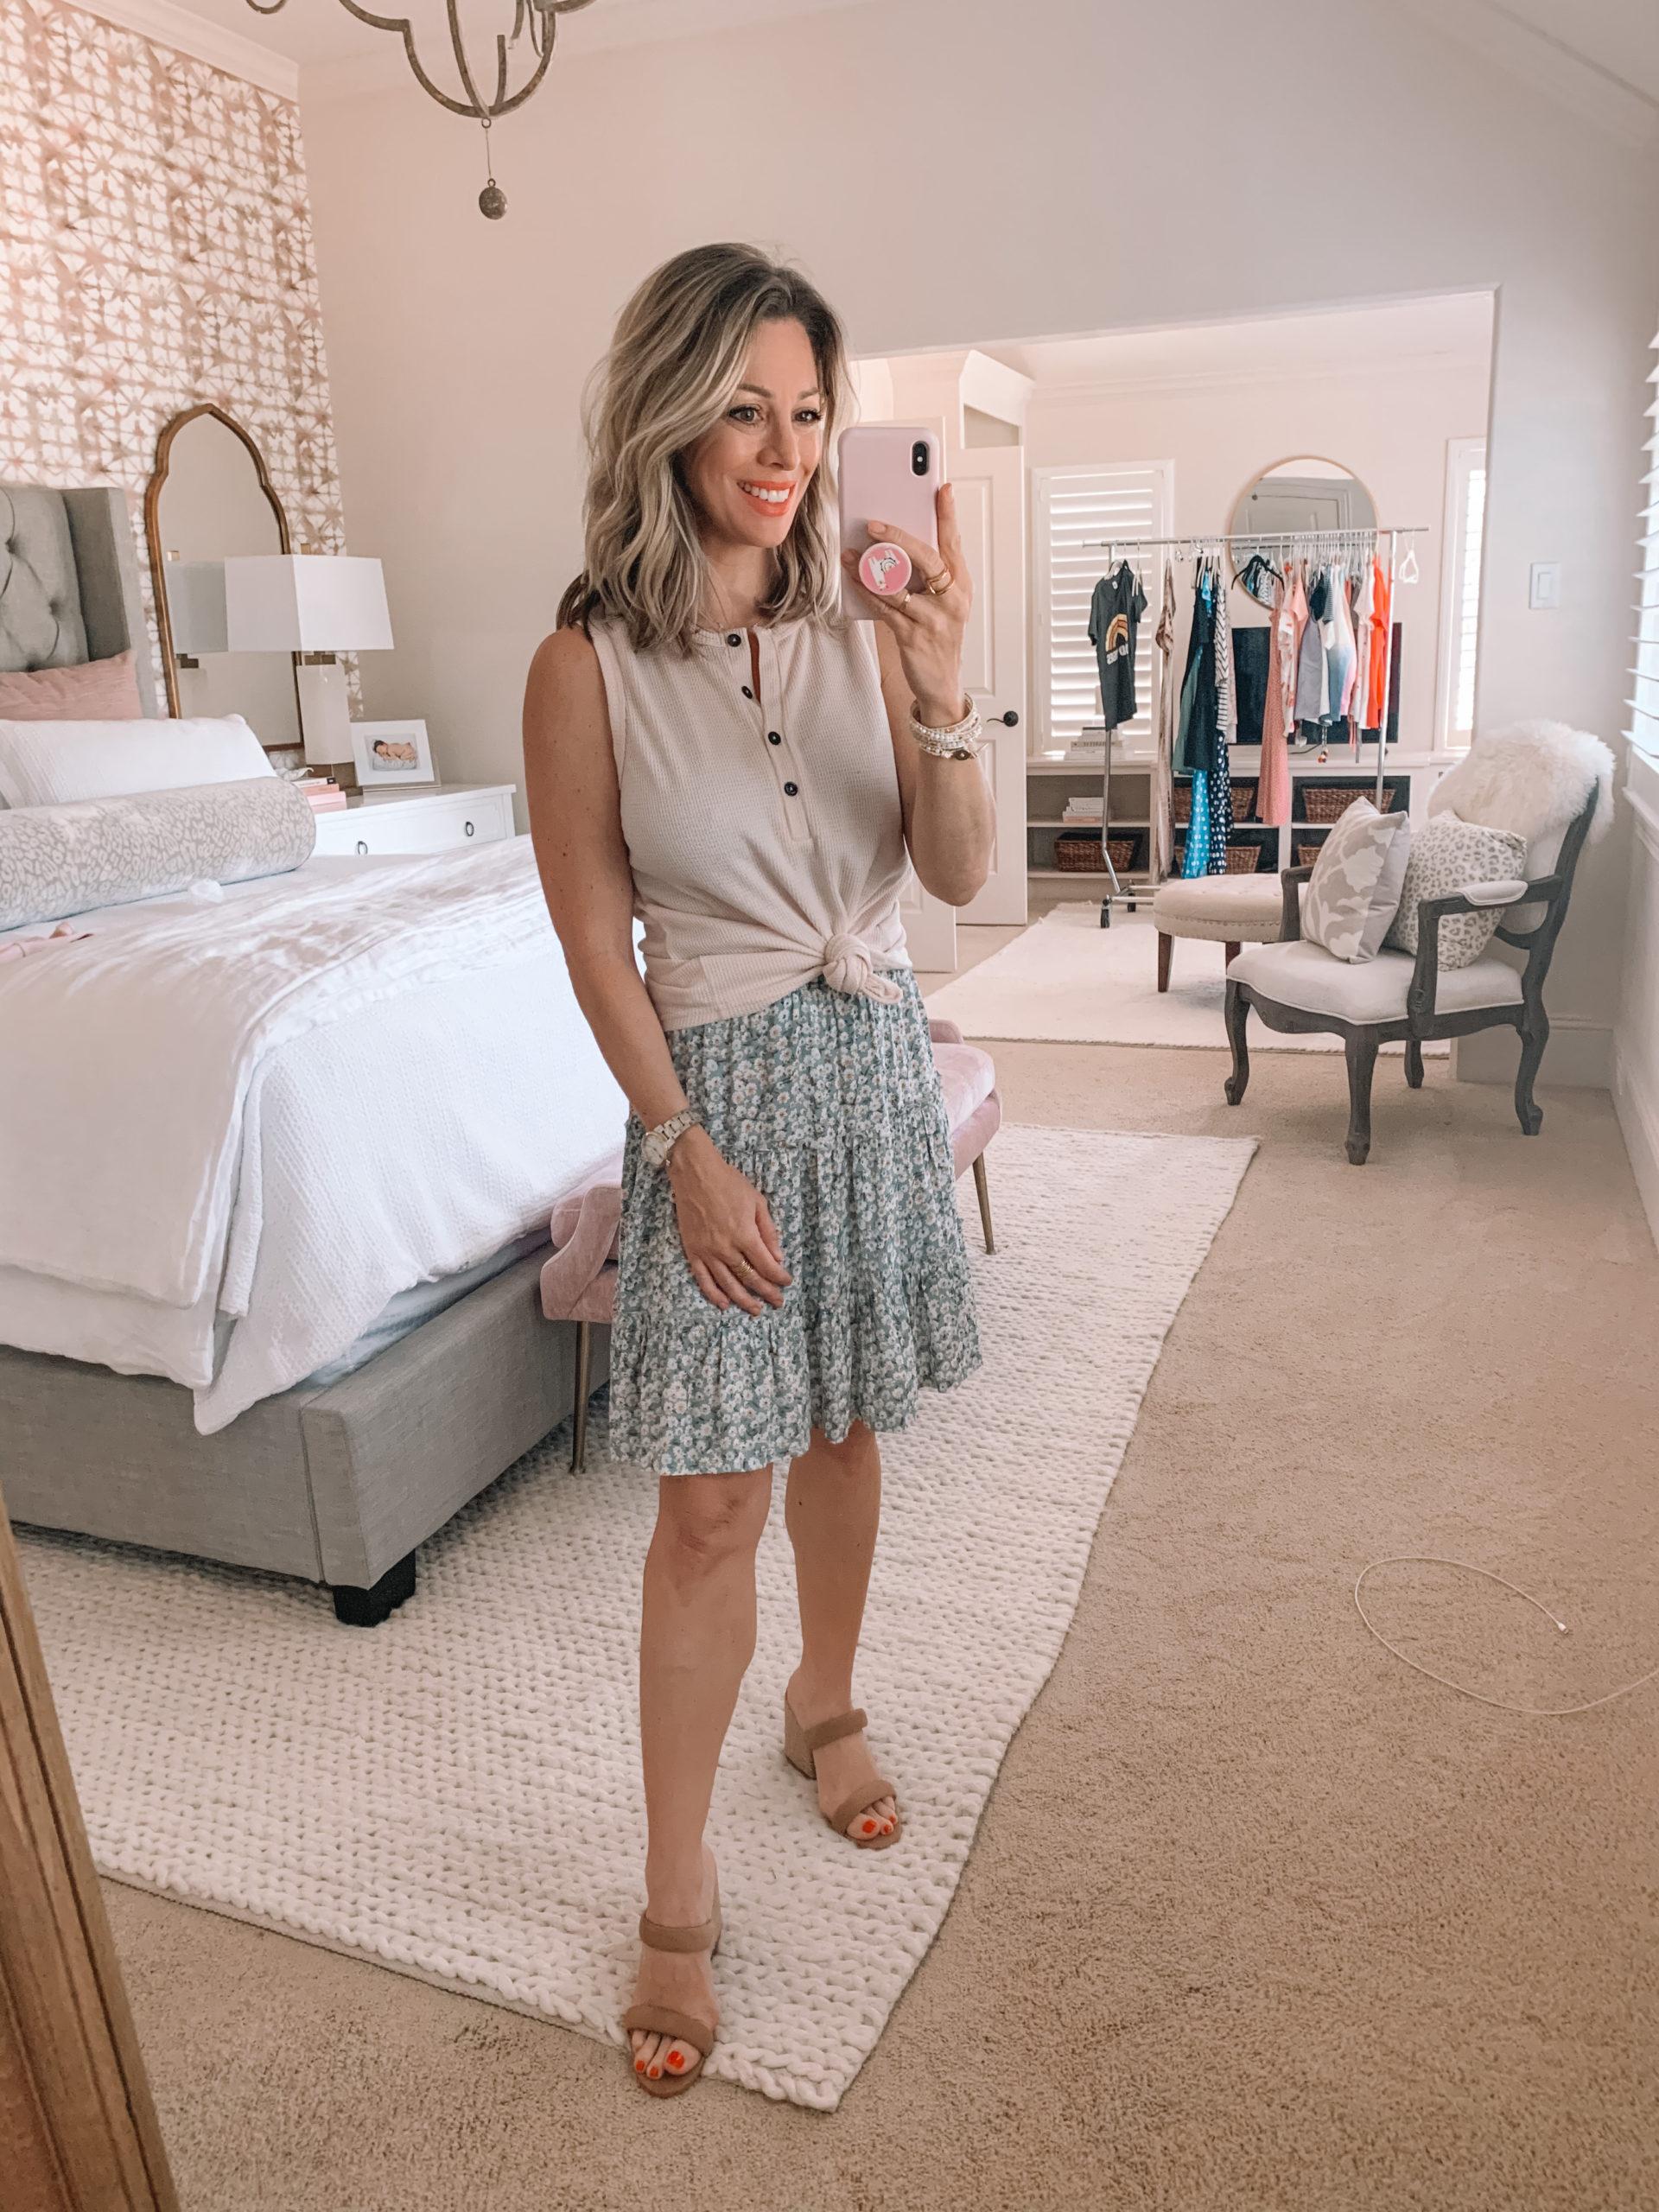 Amazon Fashion - Henley Tank, Floral Mini Skirt, Strappy Wedges